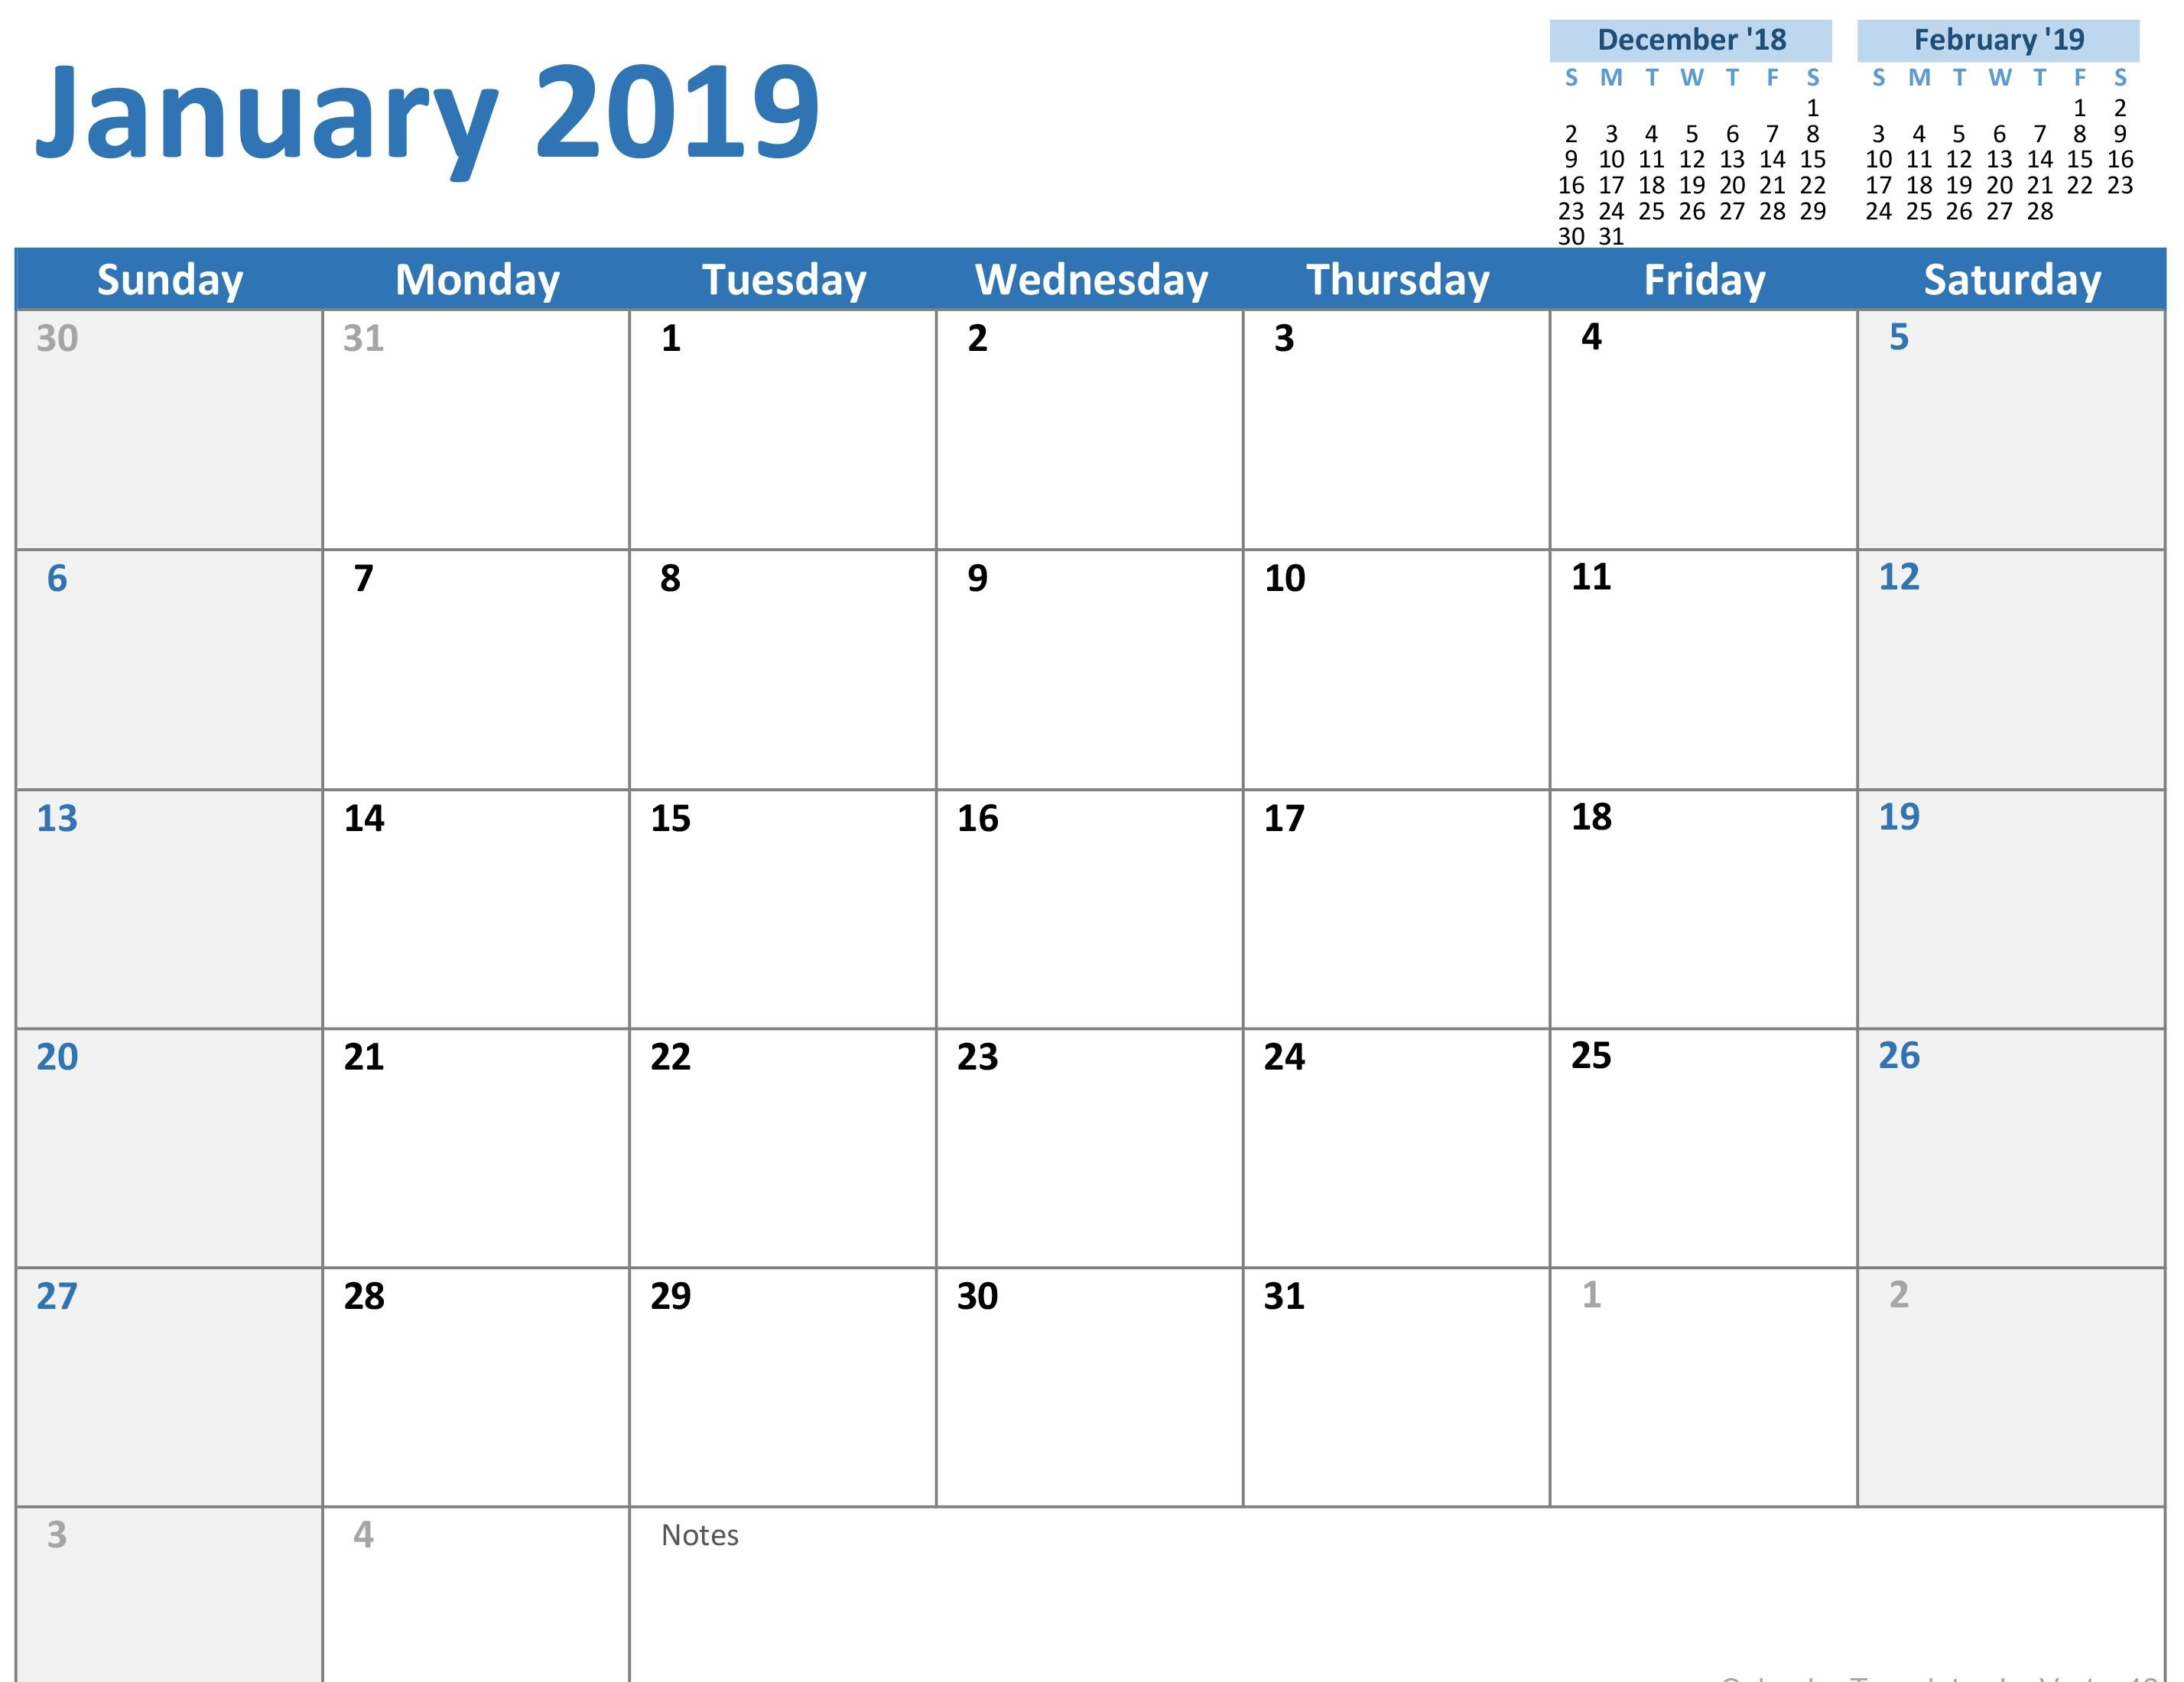 Calendar Template For Microsoft Word - Tunu.redmini.co